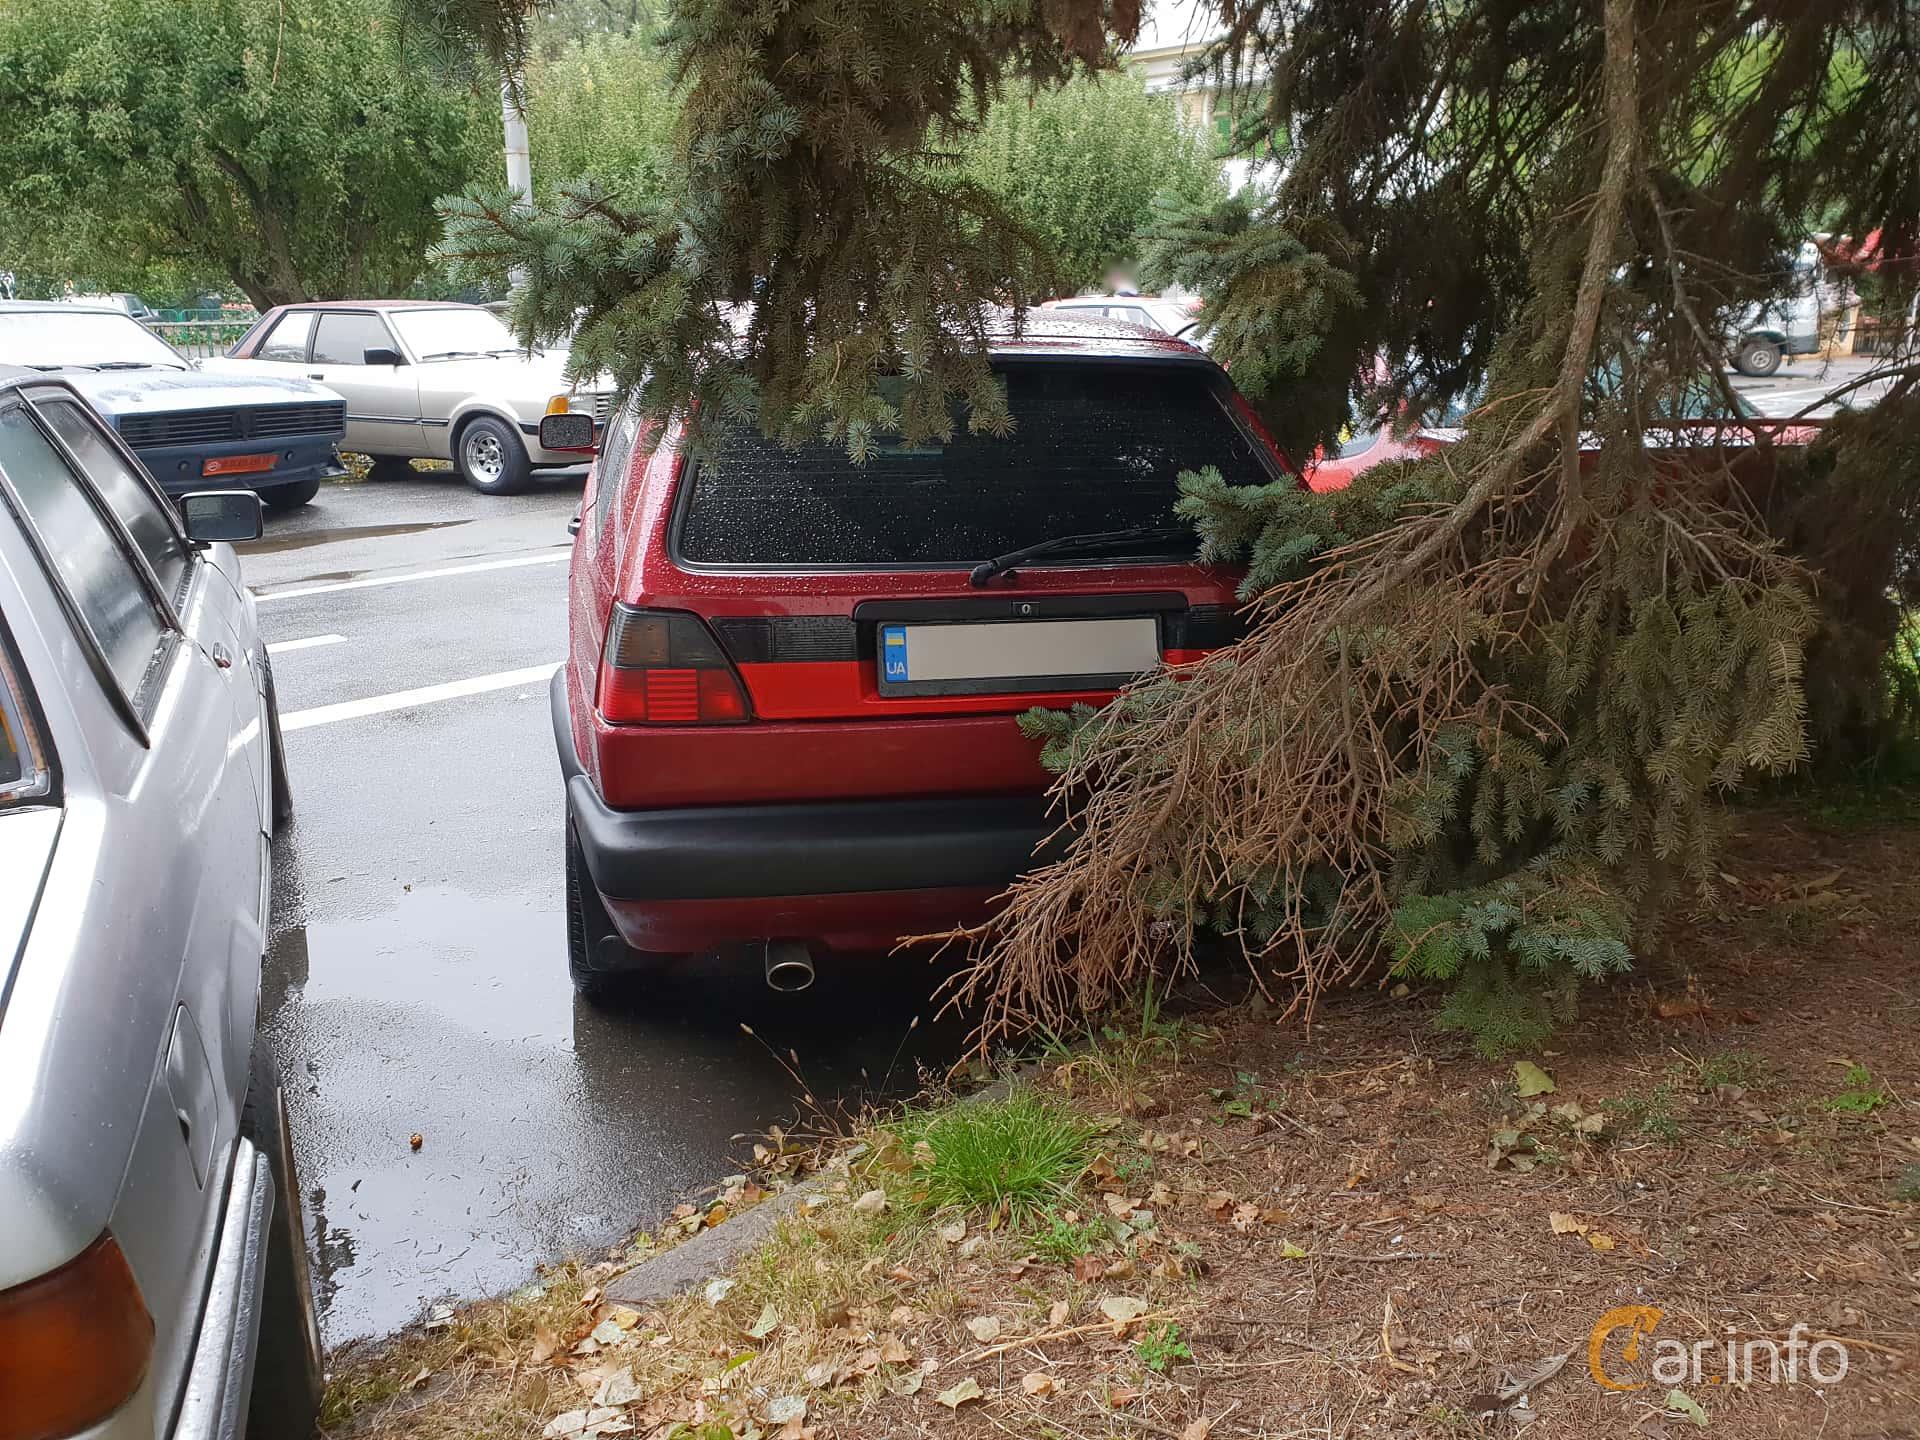 Volkswagen Golf 3-door 1.6 TD Manual, 60hp, 1989 at Old Car Land no.2 2018